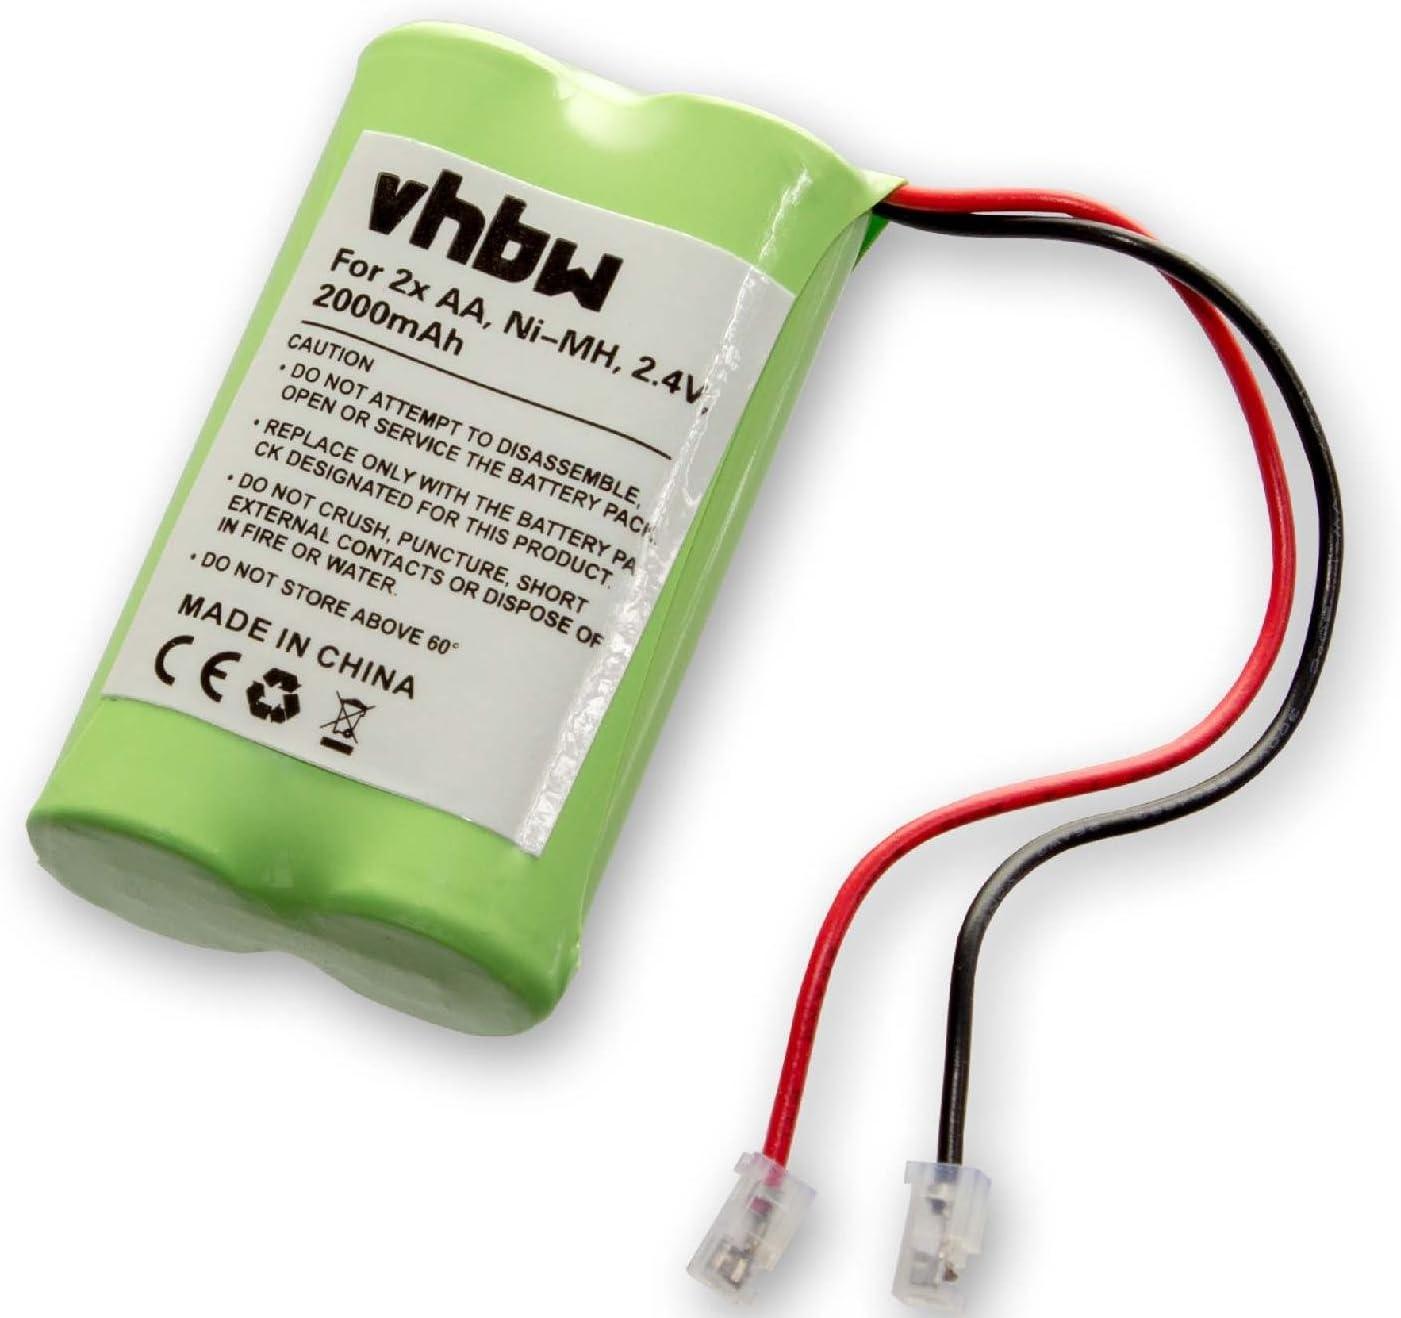 Vhbw Nimh Universal Battery Pack 2000 Mah 6 V 5 X Aa Elektronik